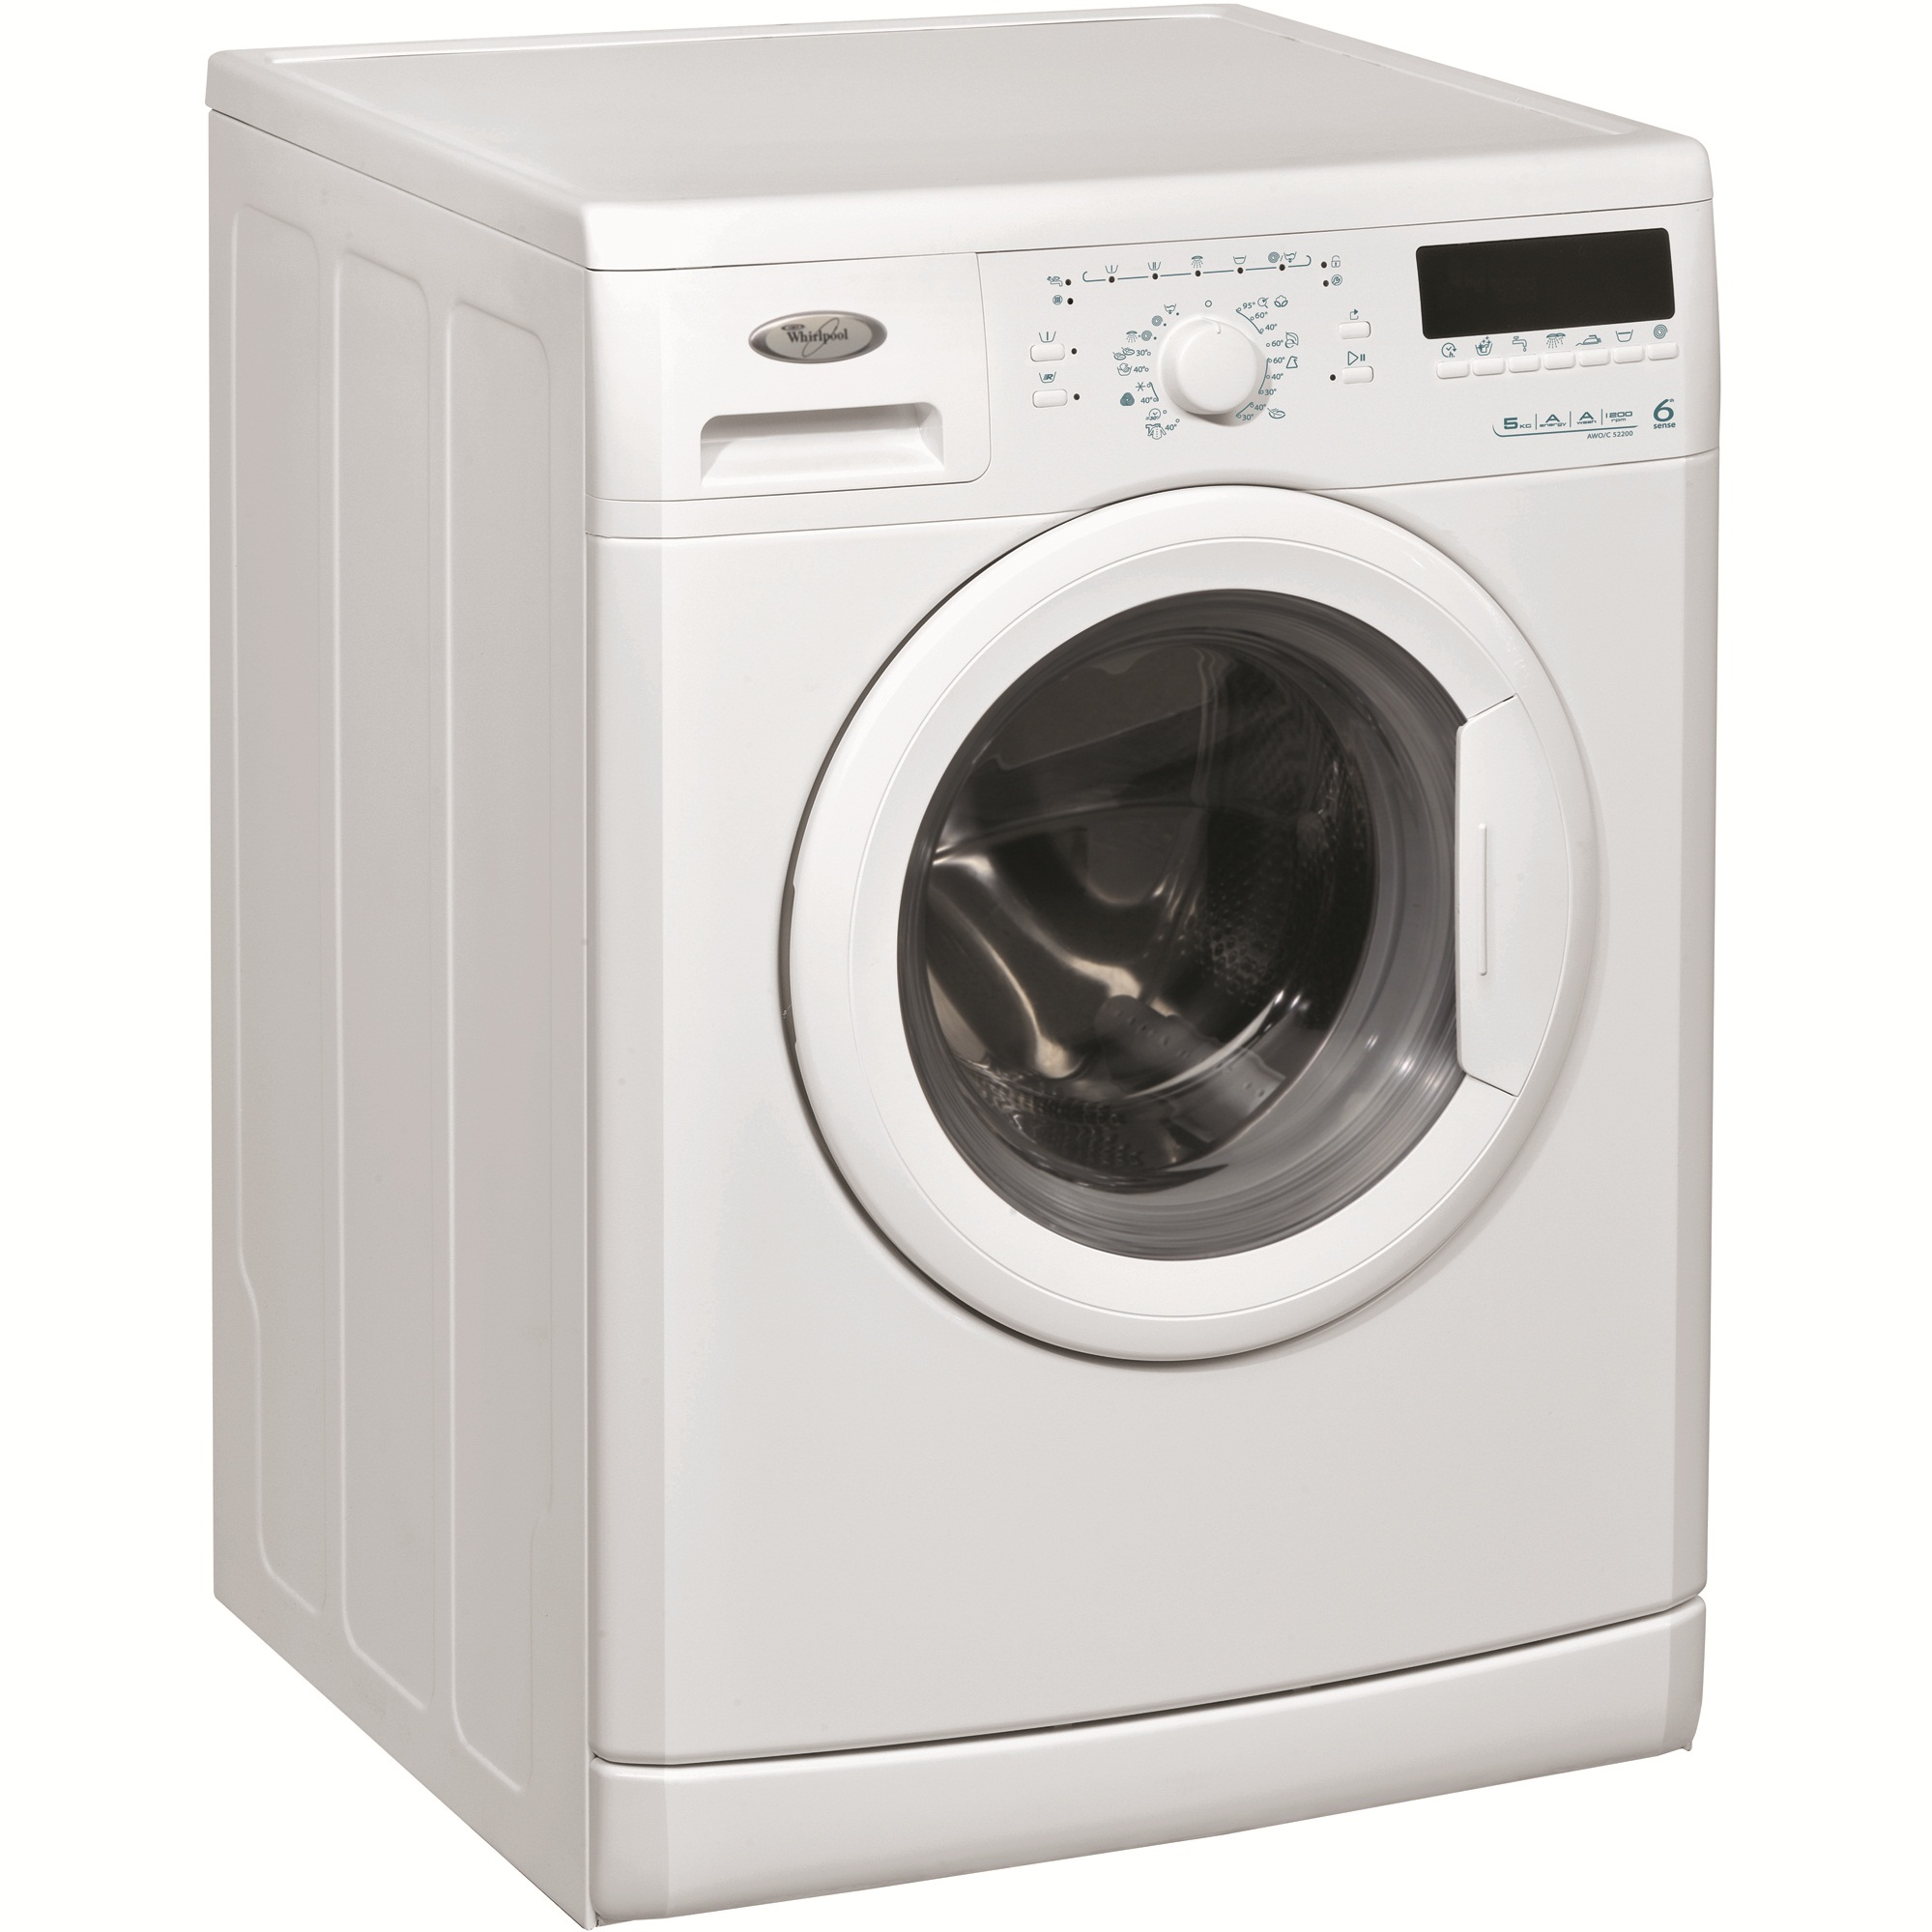 Masina de spalat rufe 6th Sense Whirlpool AWO/C52200